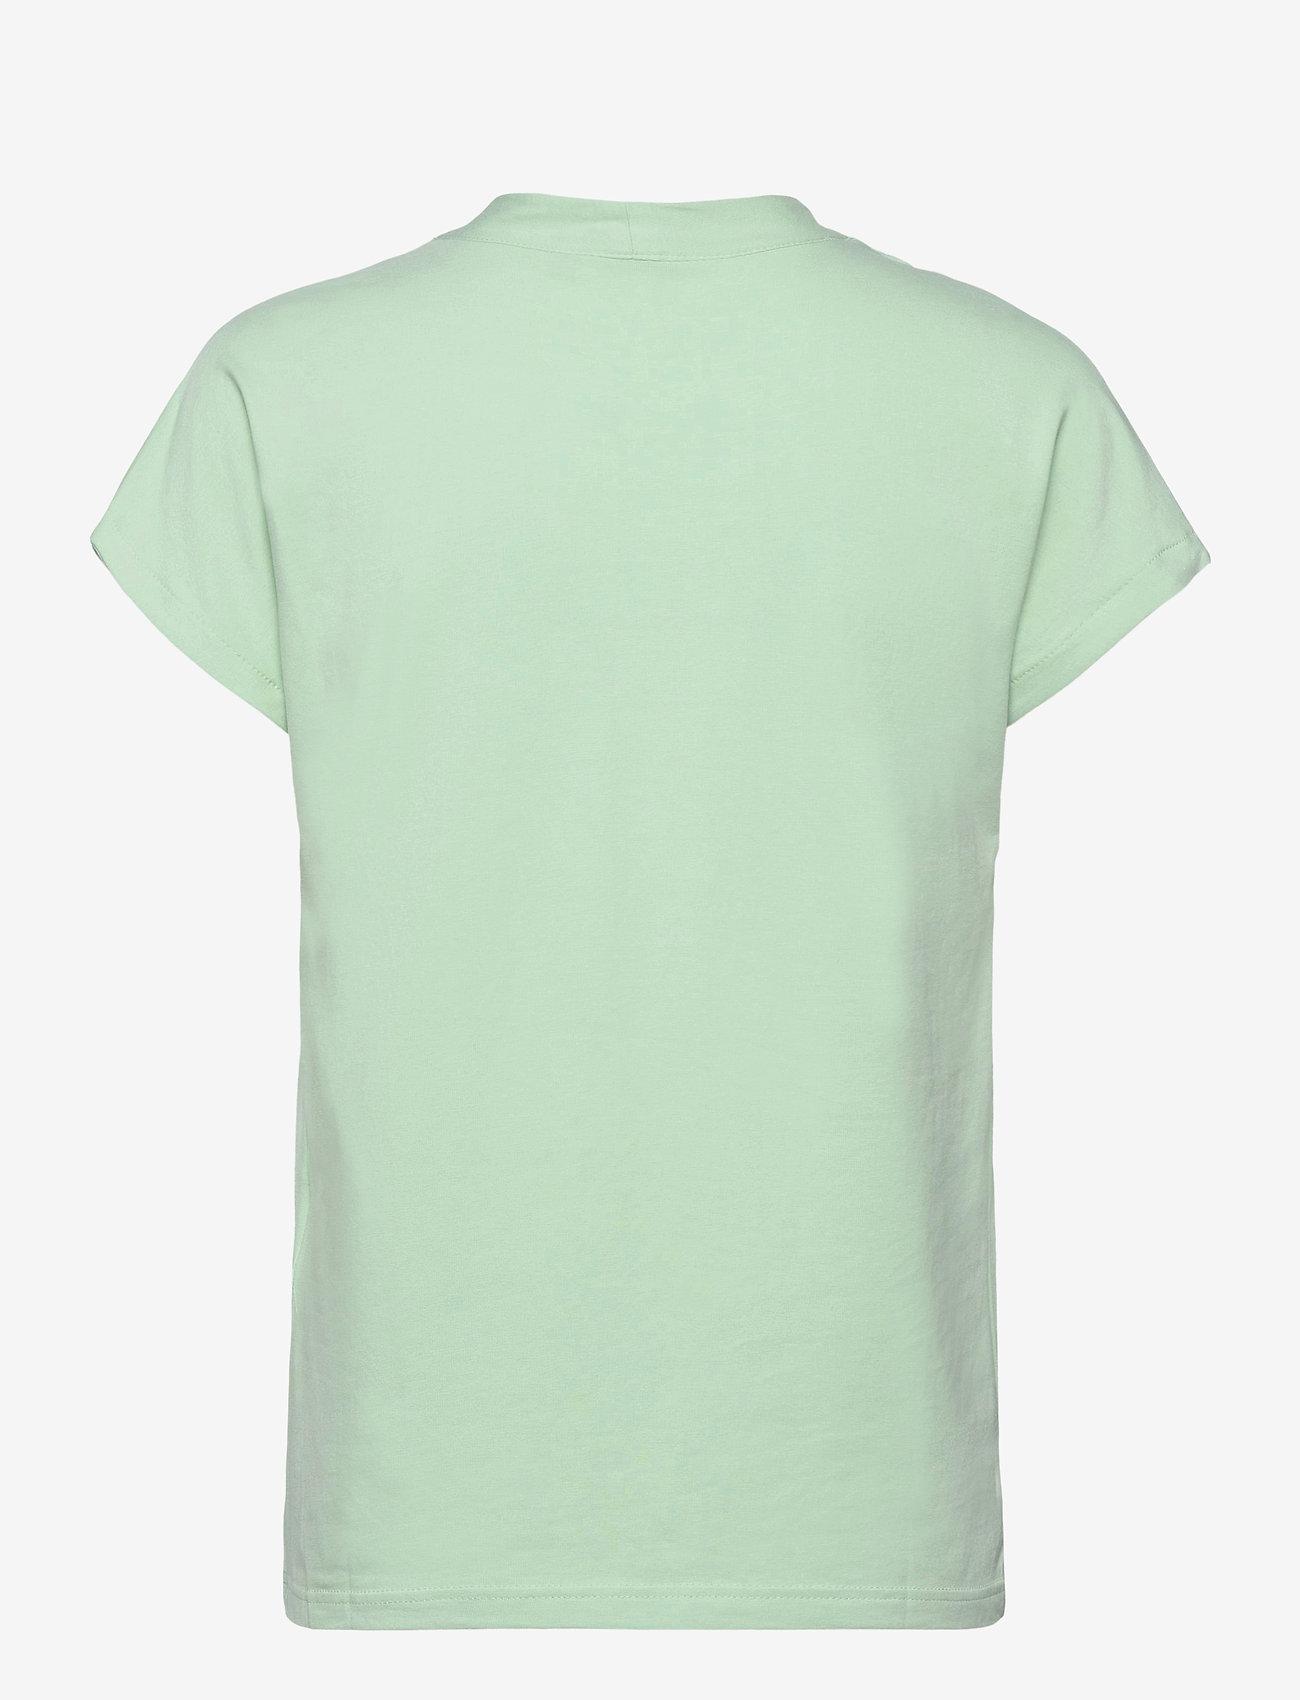 Brandtex - Sleeveless-jersey - t-shirts - lichen - 1